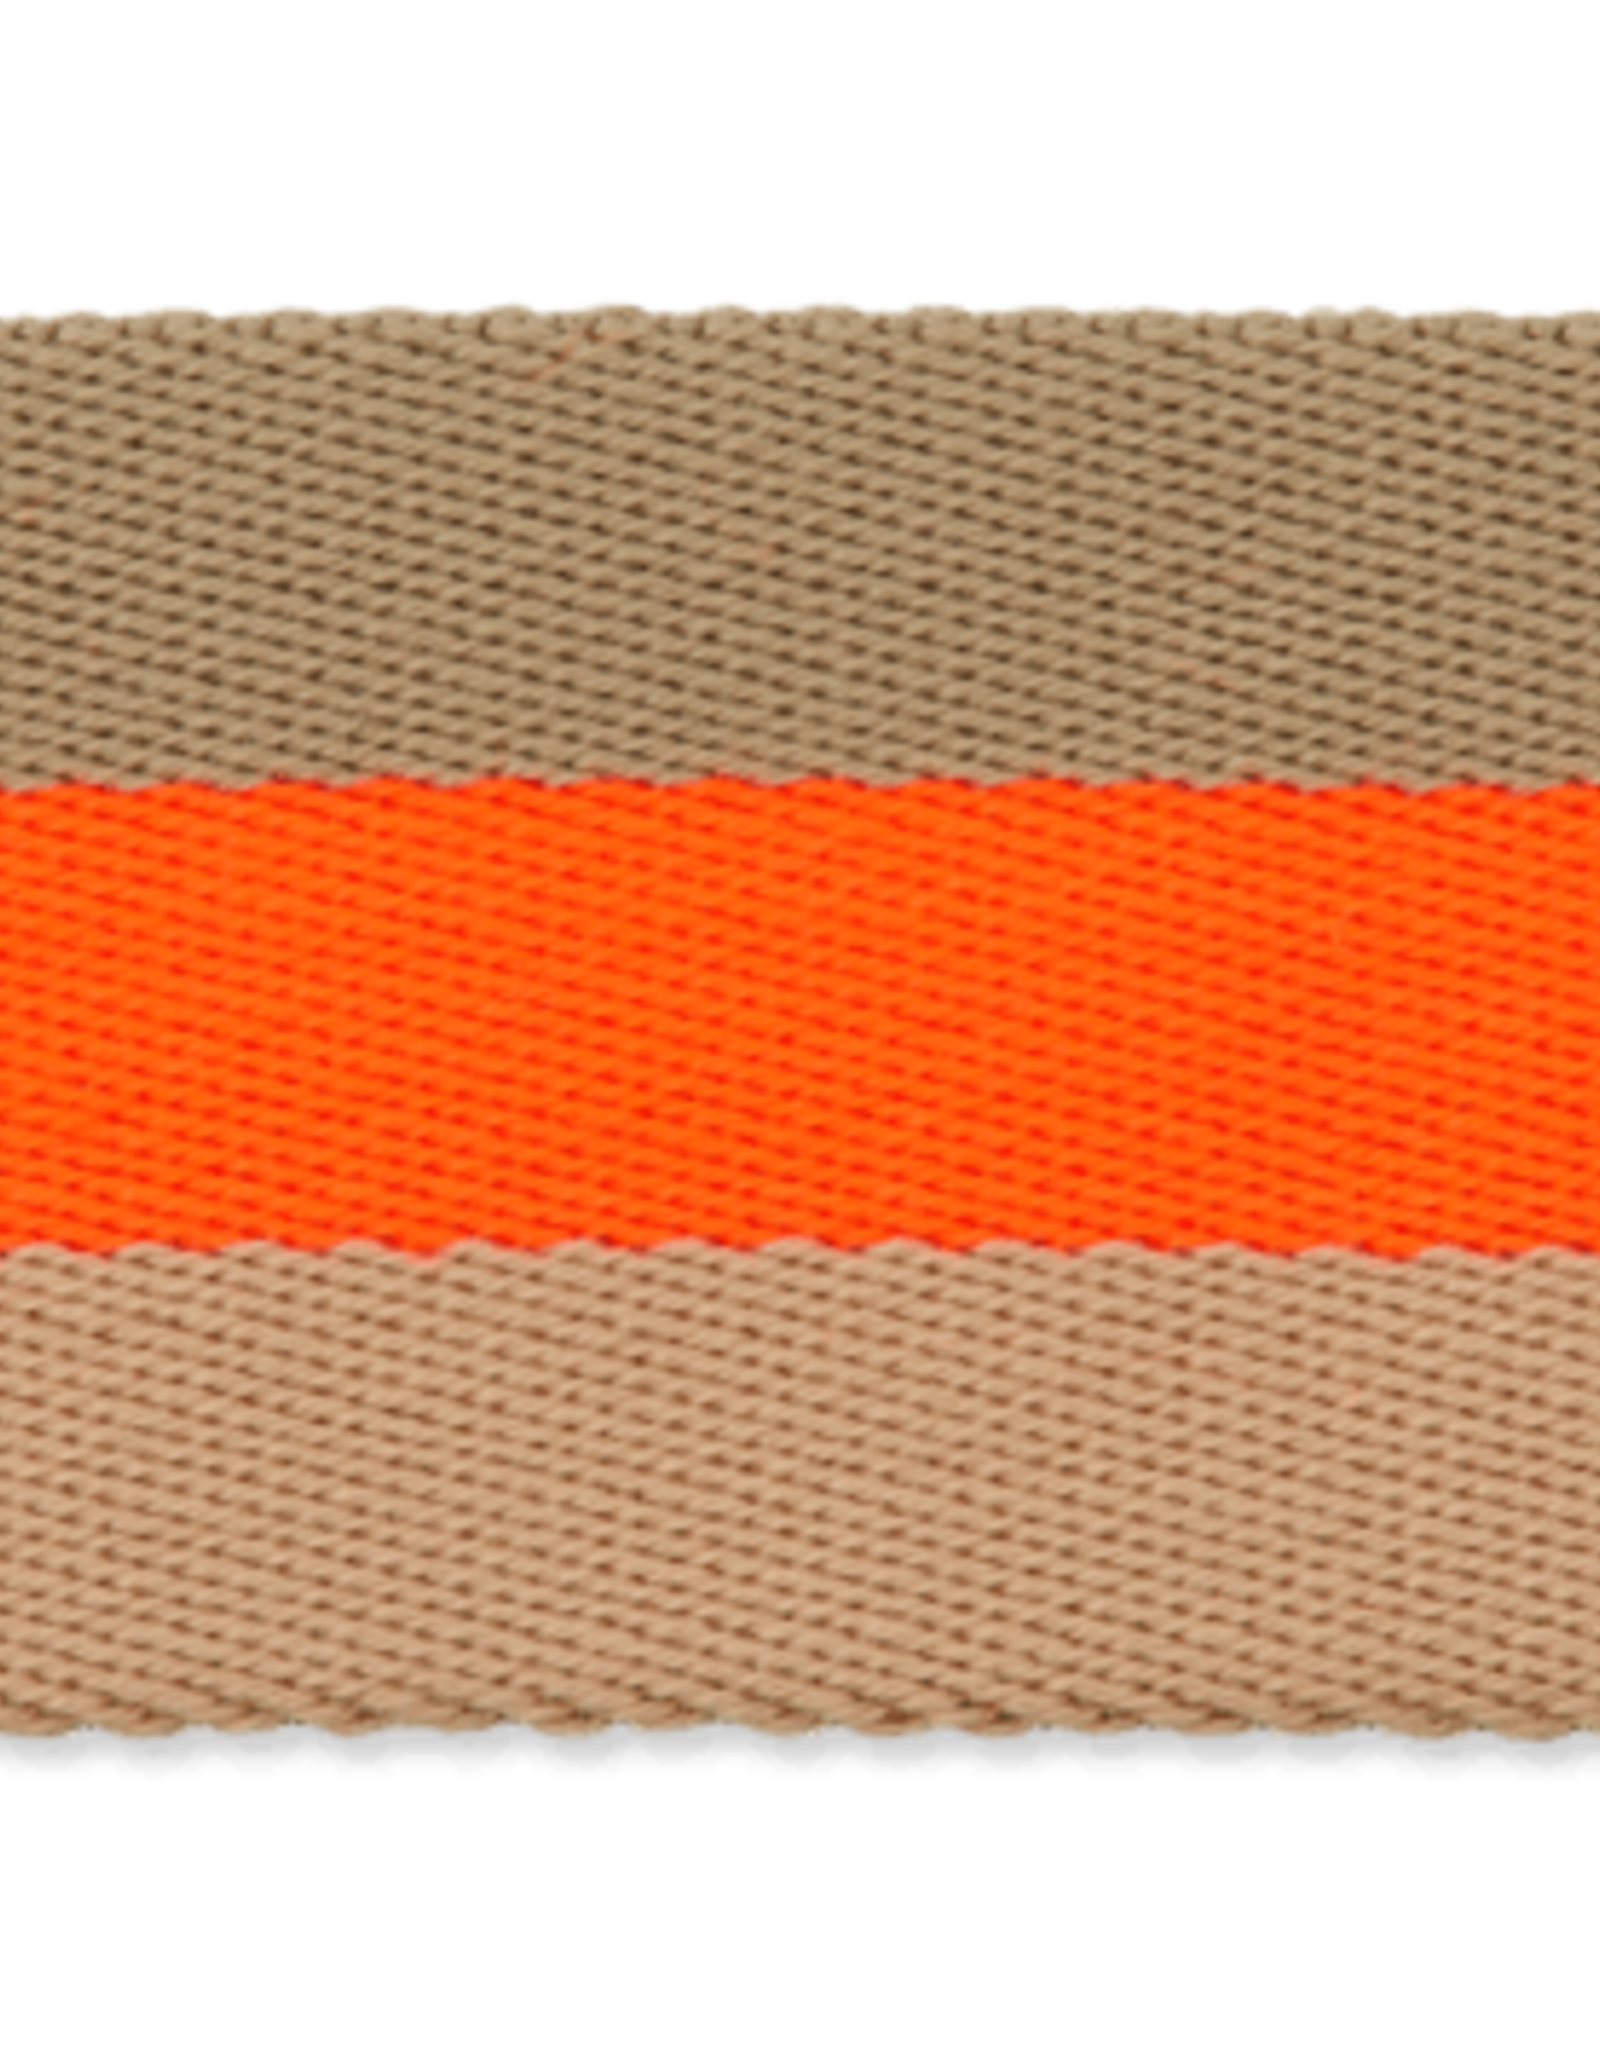 Tassenband bruin flut oranje 40mm